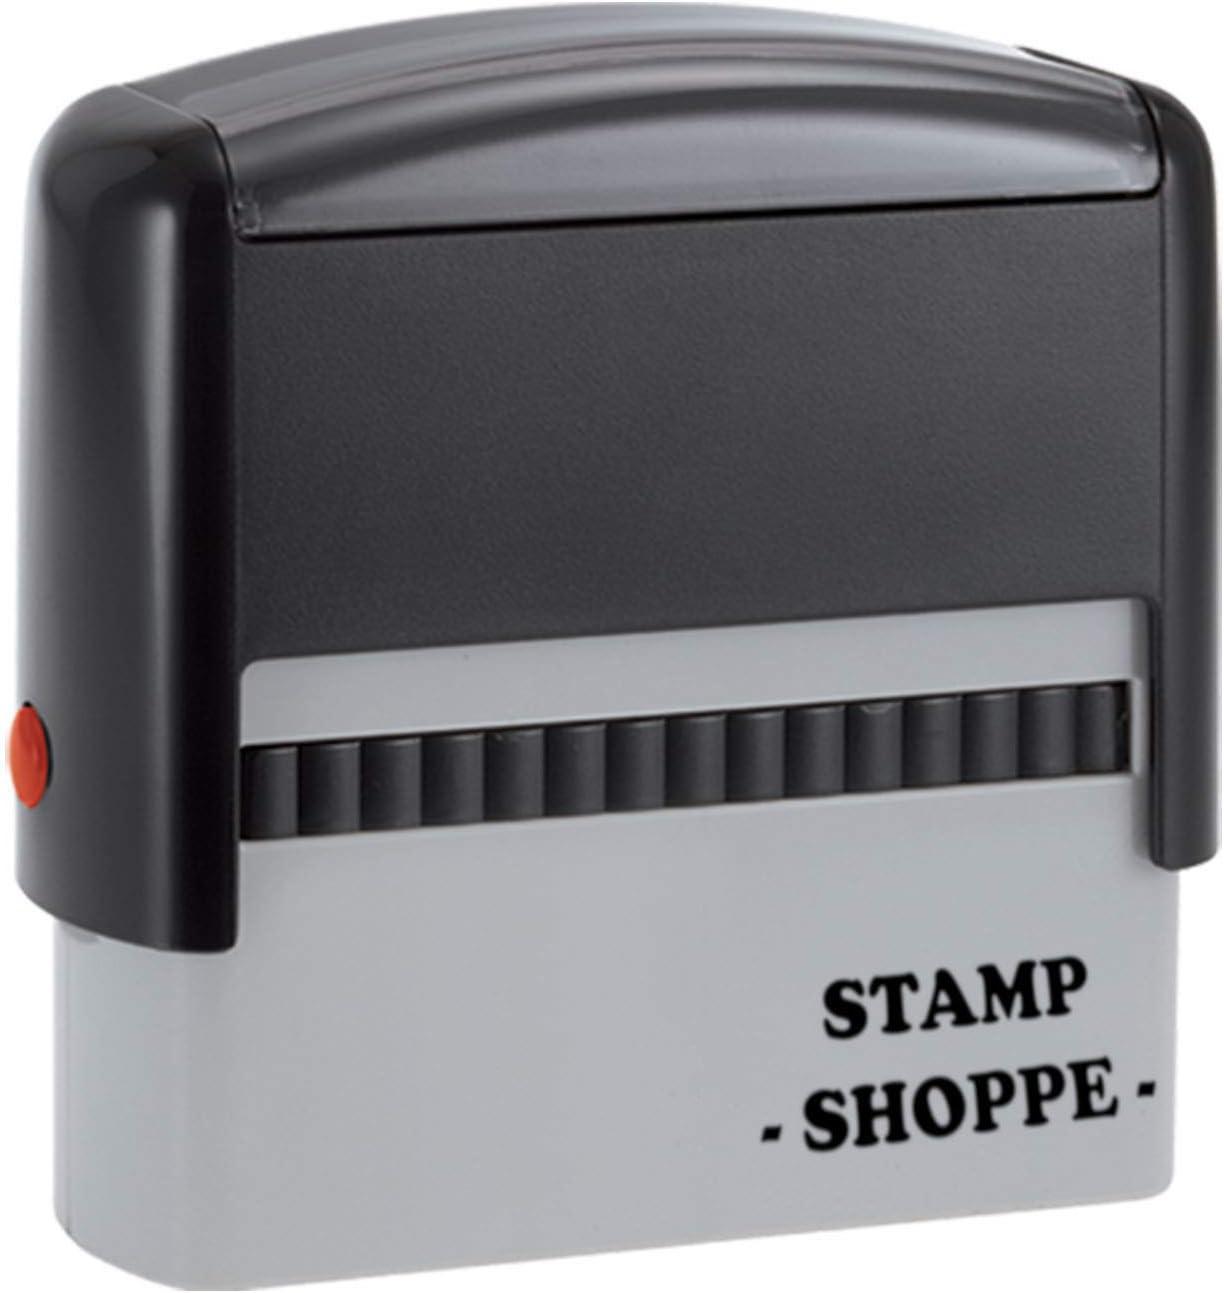 2 Line Custom Stamp | Classic Grey Model, 2.3x0.81 Inch Rectangular Prints